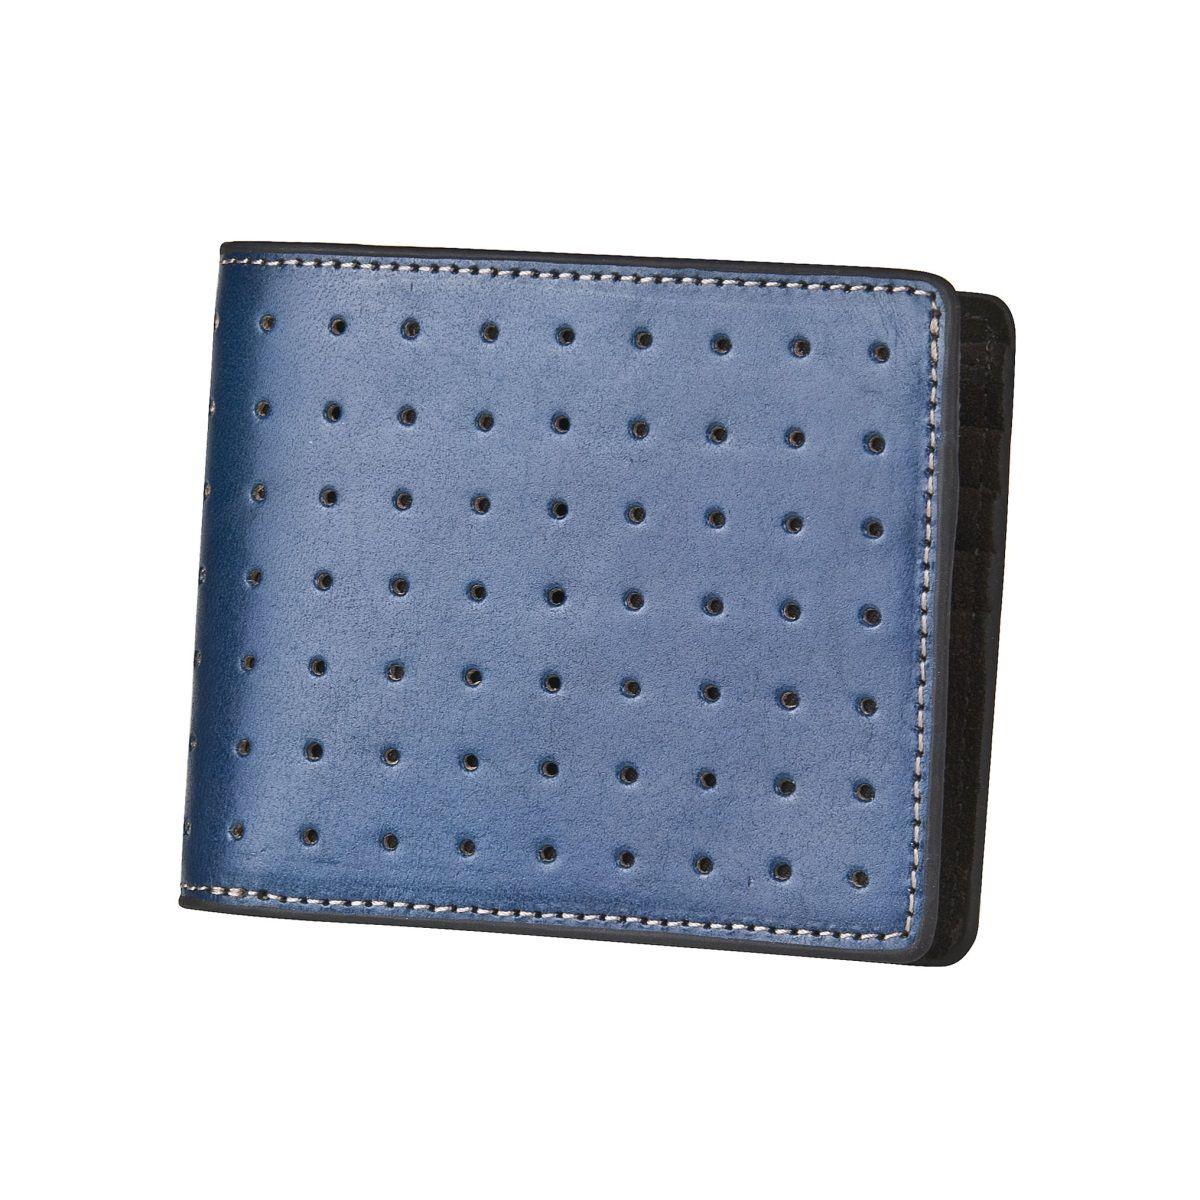 J.FOLD ארנק עור Loungemaster - כחול